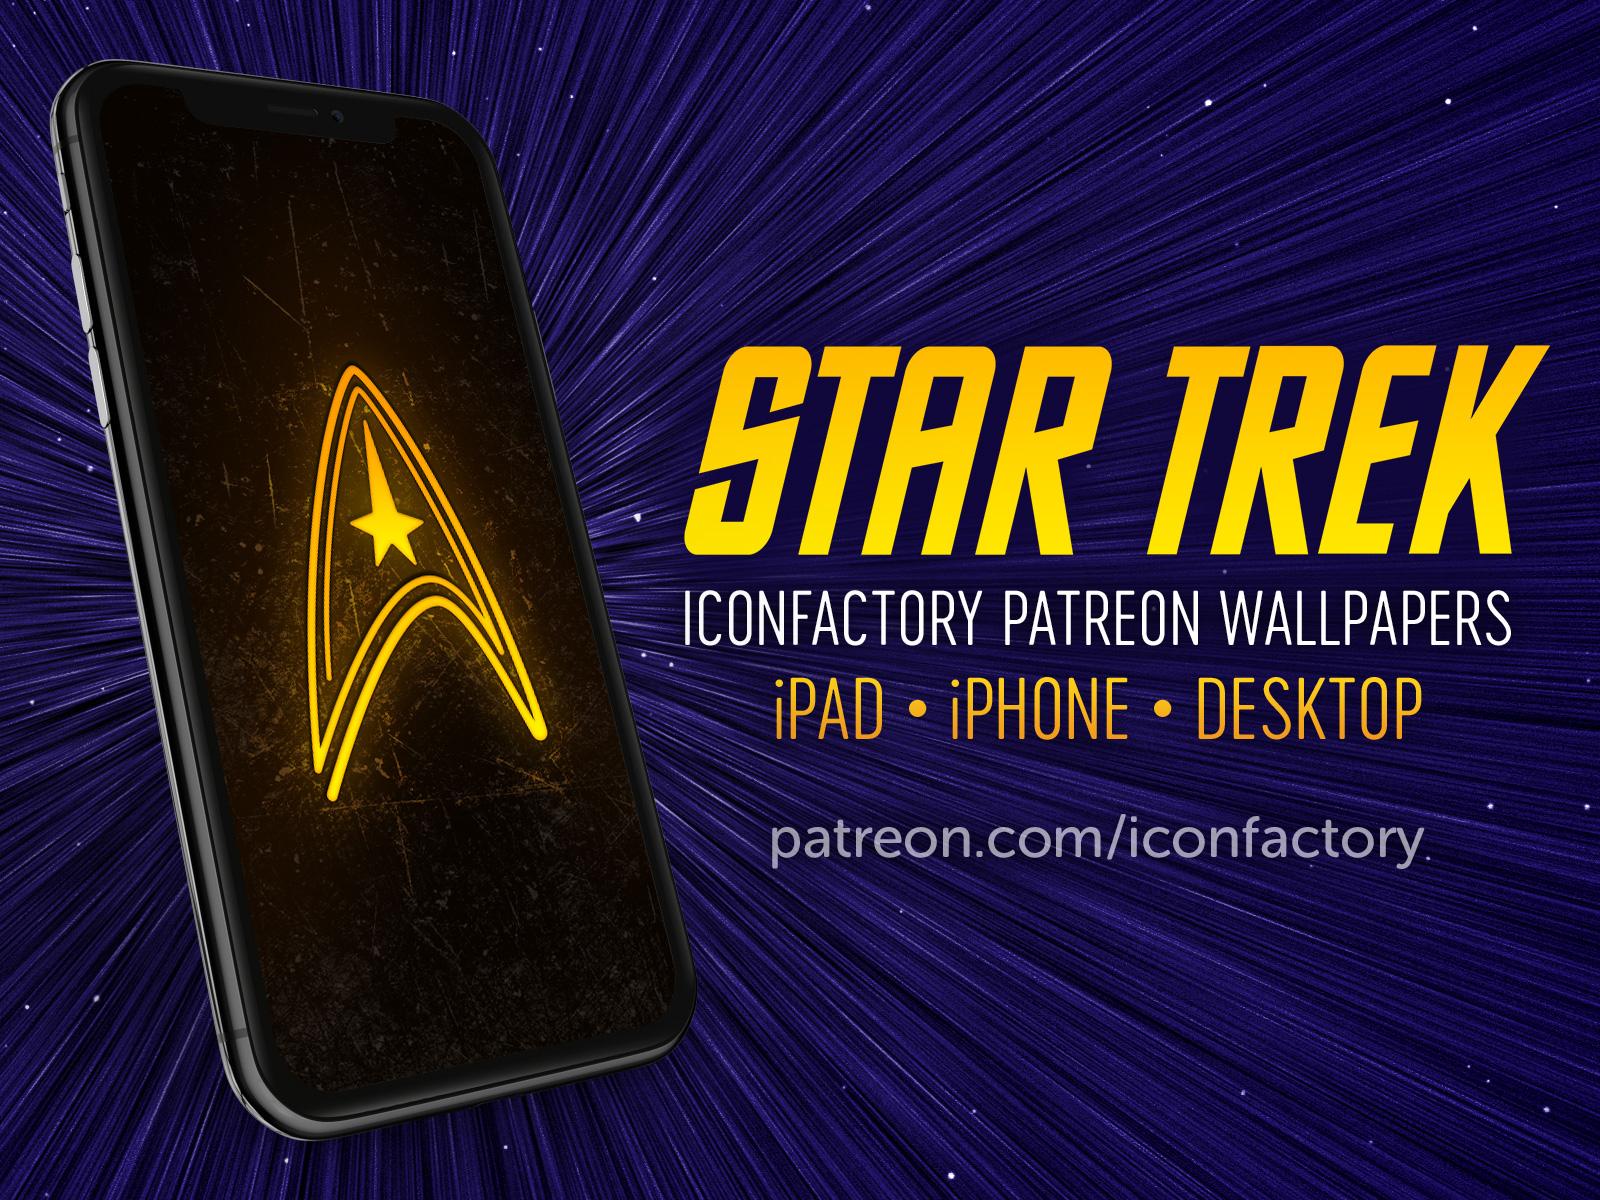 Star Trek Wallpaper By Iconfactory On Dribbble